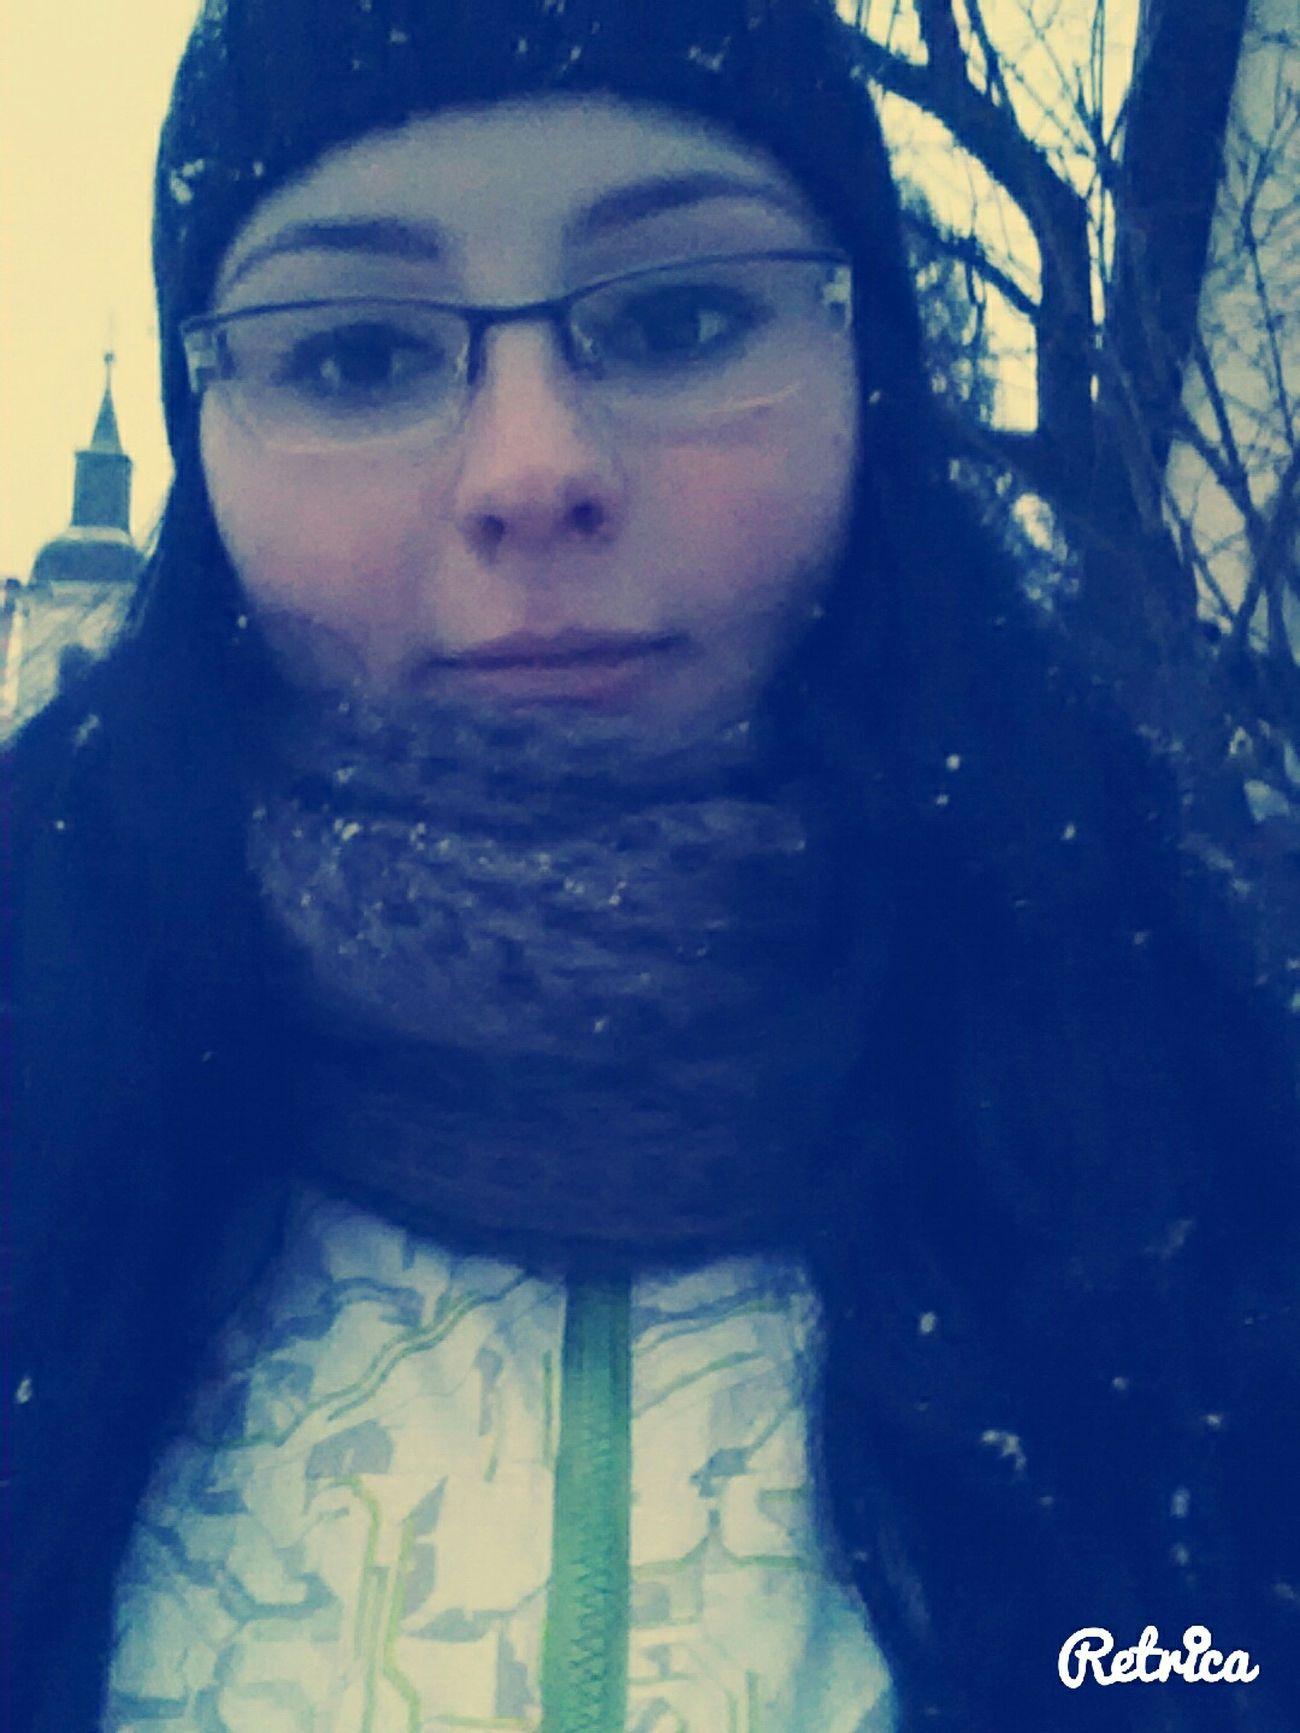 Slovensko Dovolena Snow ❄ Cold Winter ❄⛄ Wintertime -12 Outside! Habovka Zuberec Pohodicka Brunette ❄❤?